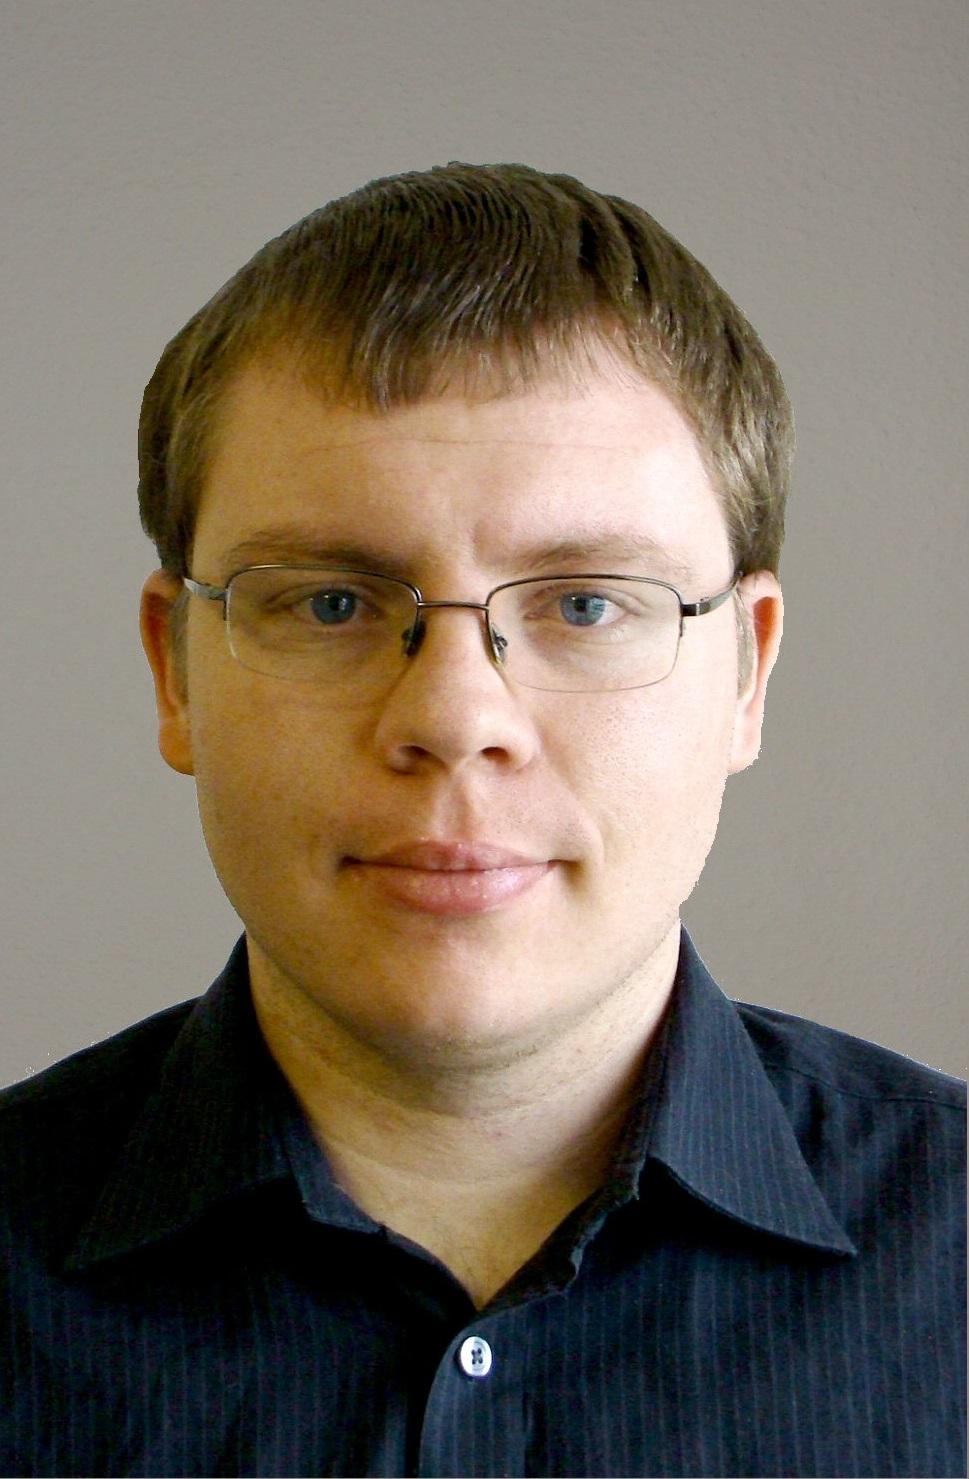 Stefan Rieger